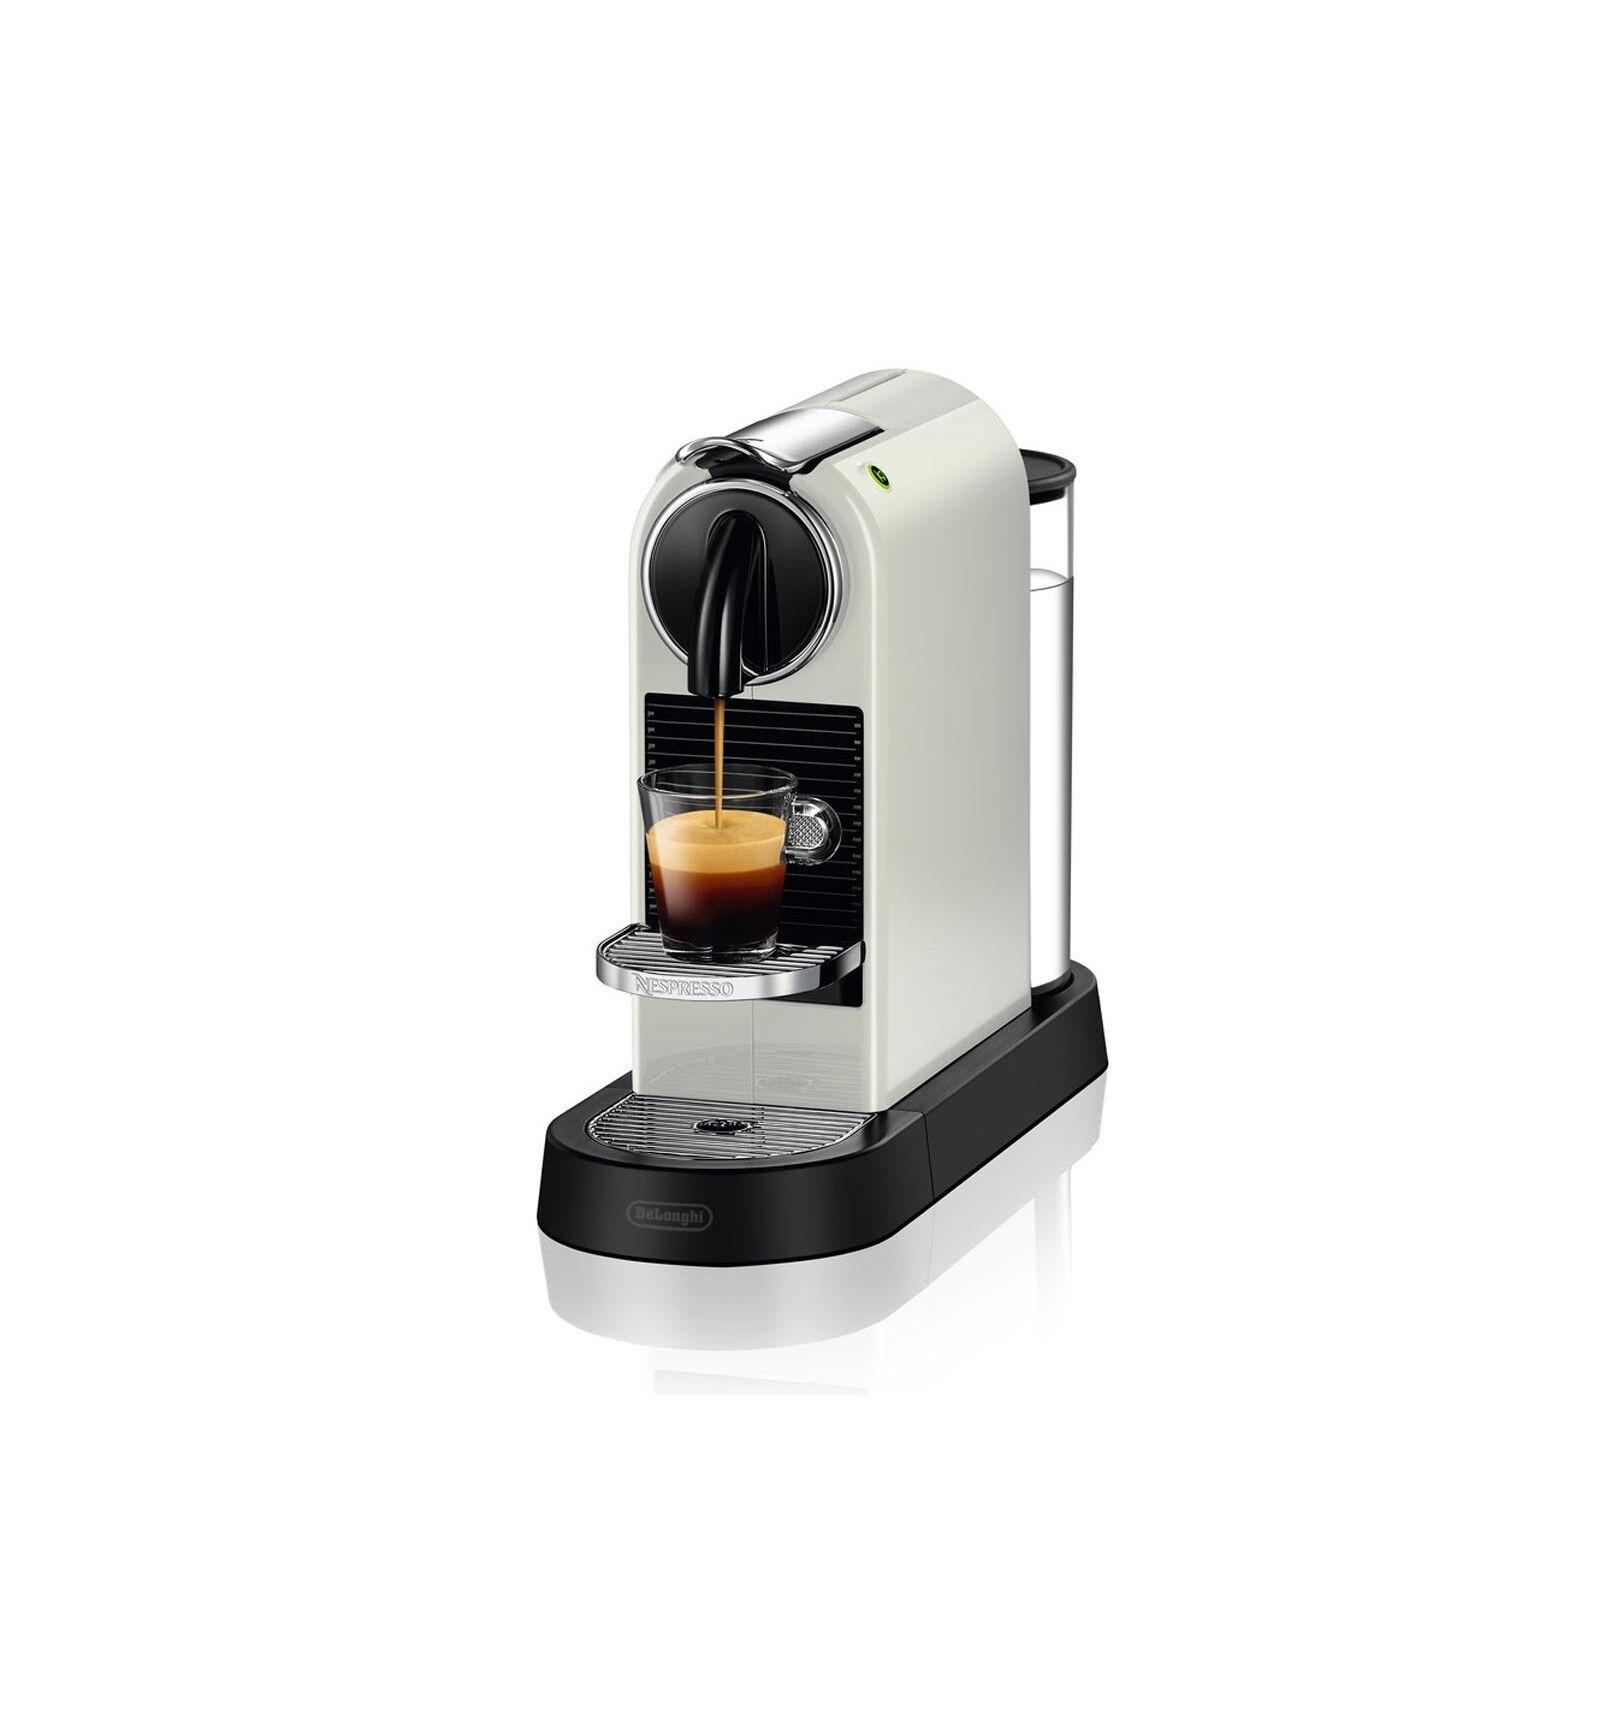 DeLonghi Citiz EN 167.W Kahvikapselikone 1 L Täysautomaattinen